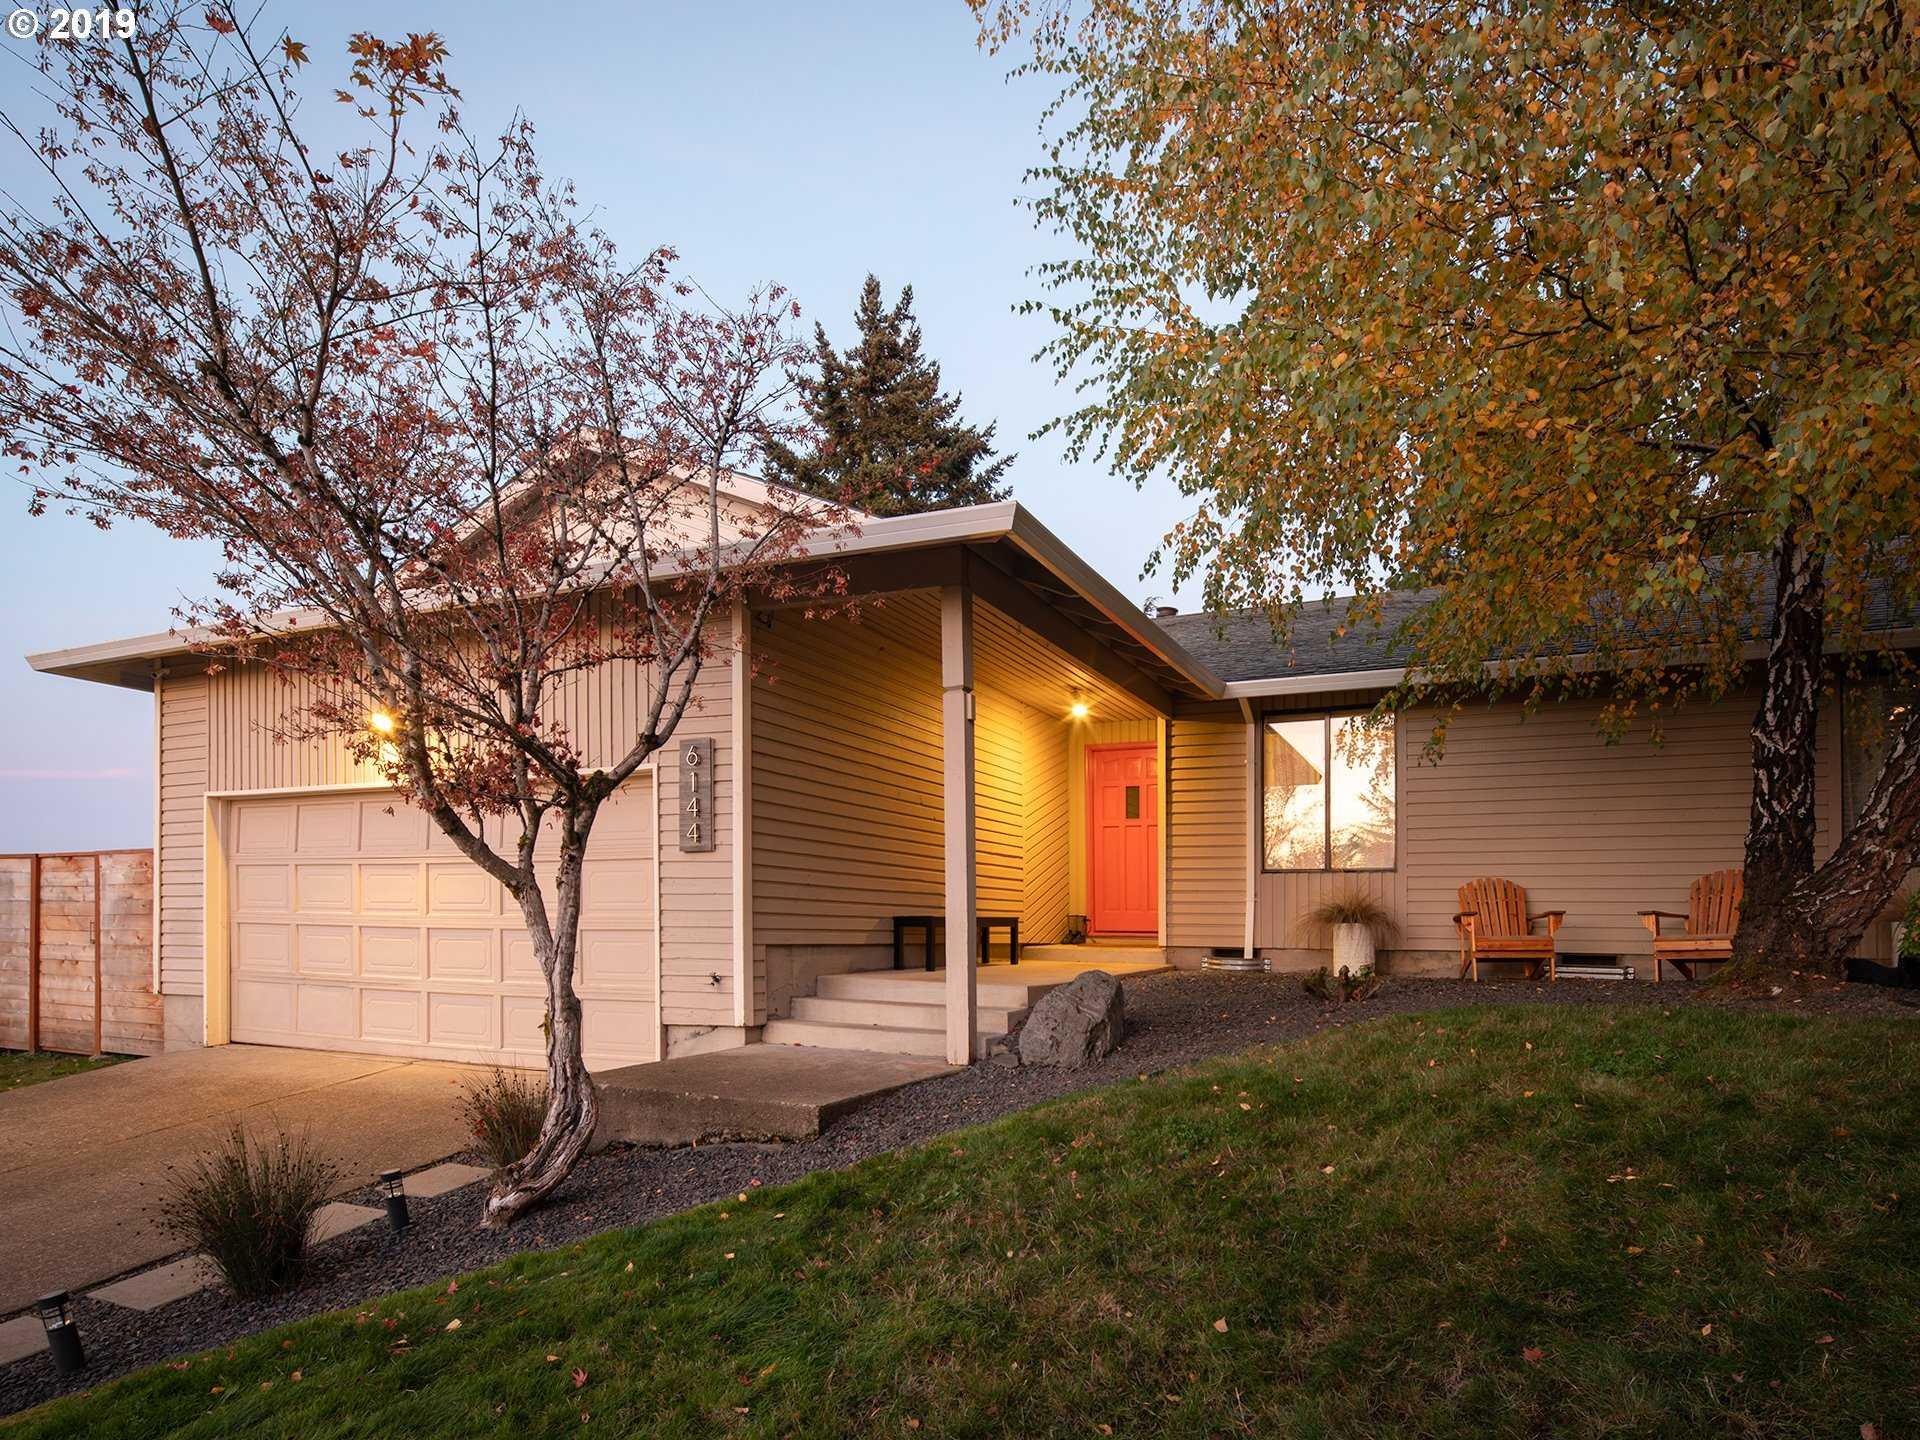 $385,000 - 3Br/2Ba - for Sale in Evergreen Terrace, Beaverton